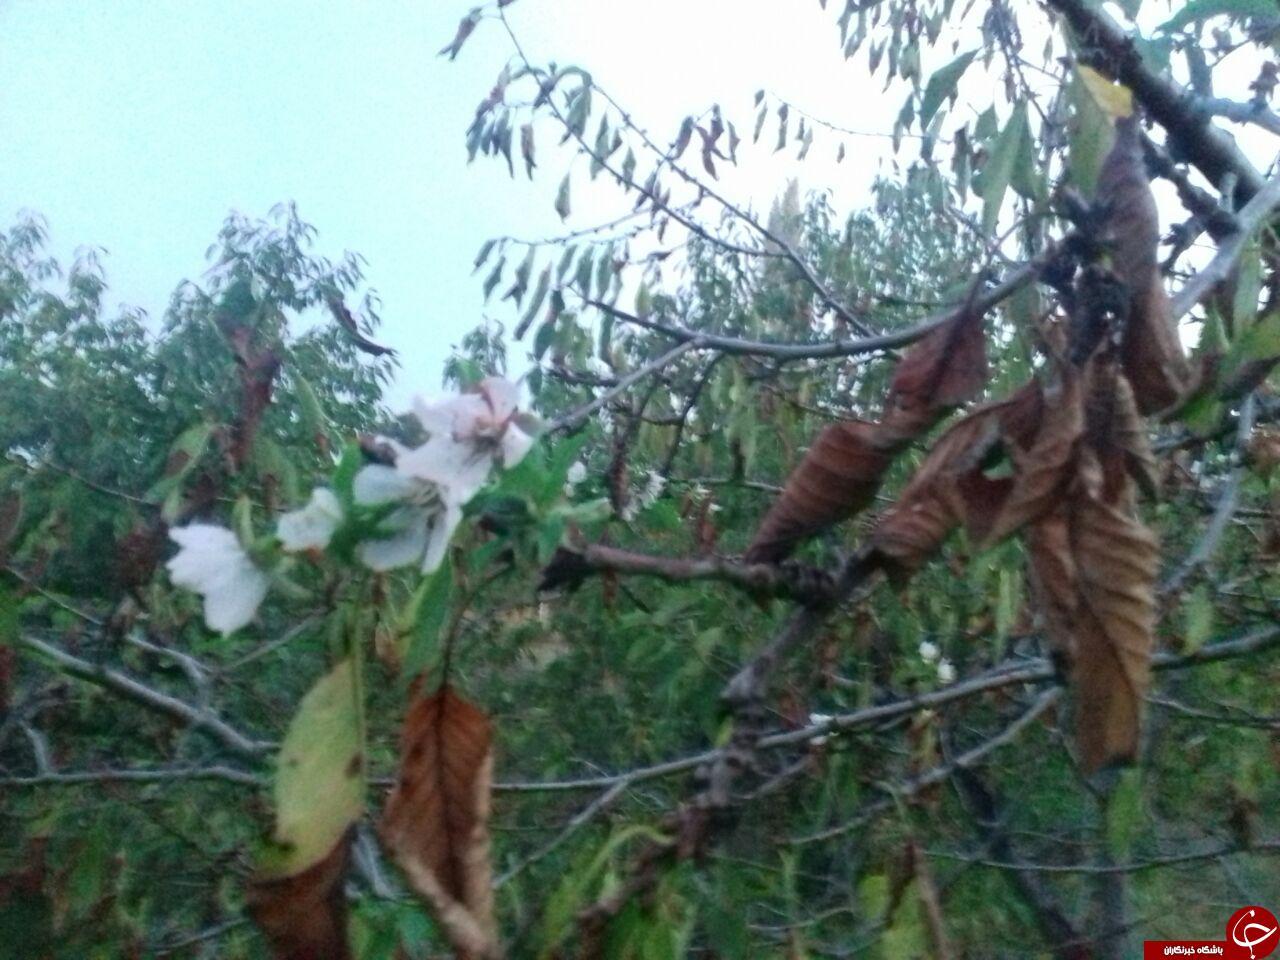 شکوفایی درخت گیلاس در «خوی» + تصاویر